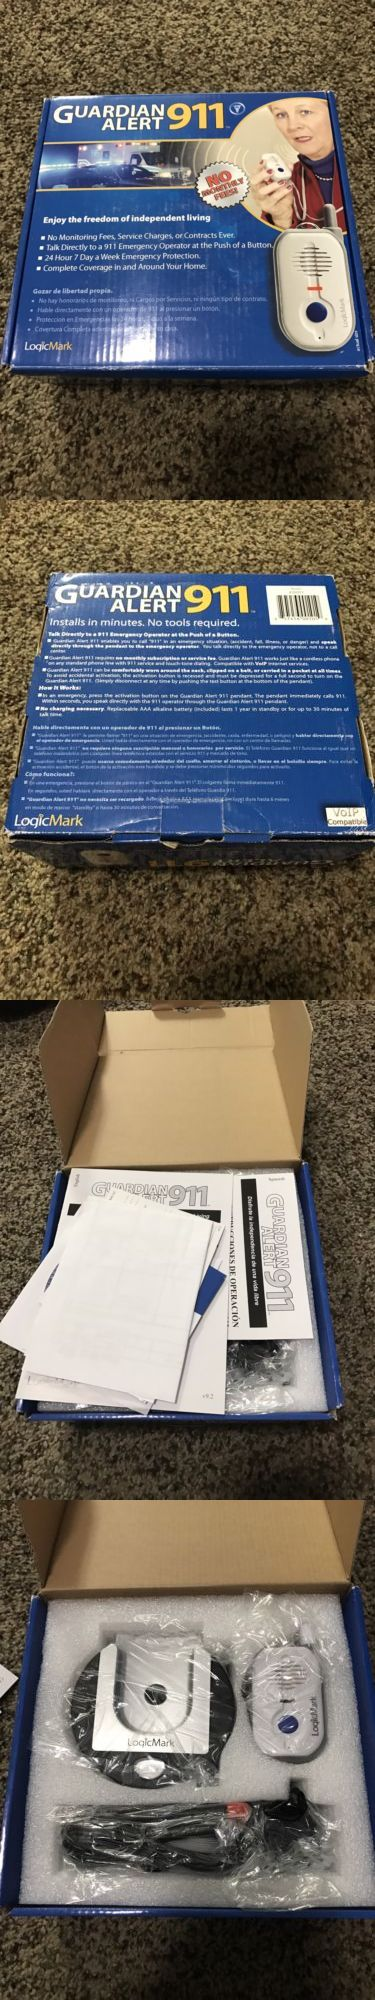 Emergency Alert Systems: Logicmark Guardian Alert 911 Emergency Alert System New Open Box -> BUY IT NOW ONLY: $50 on eBay!